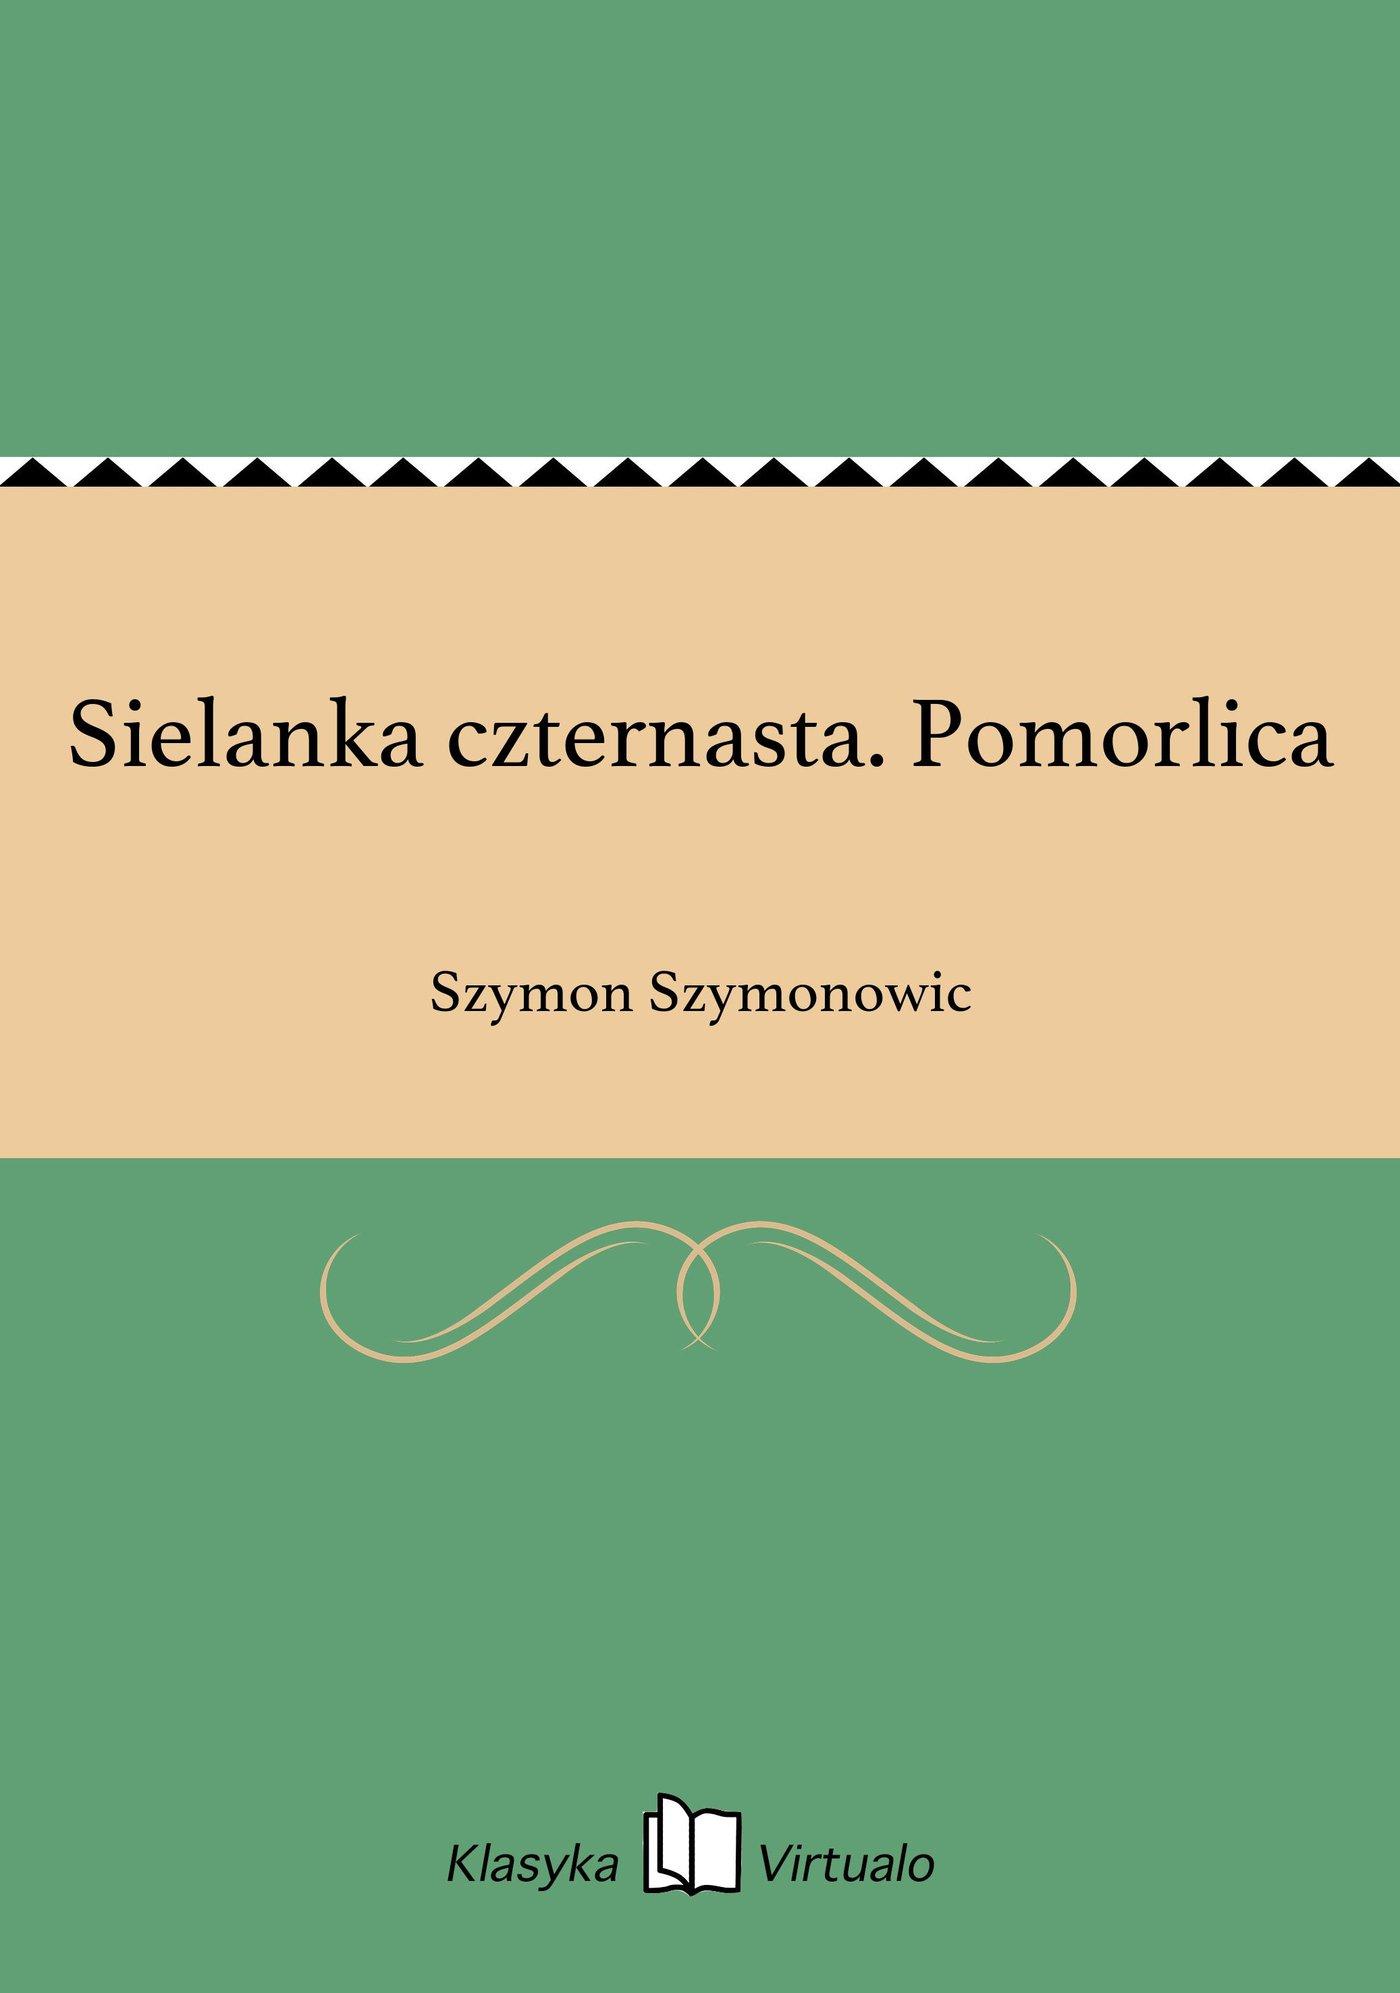 Sielanka czternasta. Pomorlica - Ebook (Książka na Kindle) do pobrania w formacie MOBI